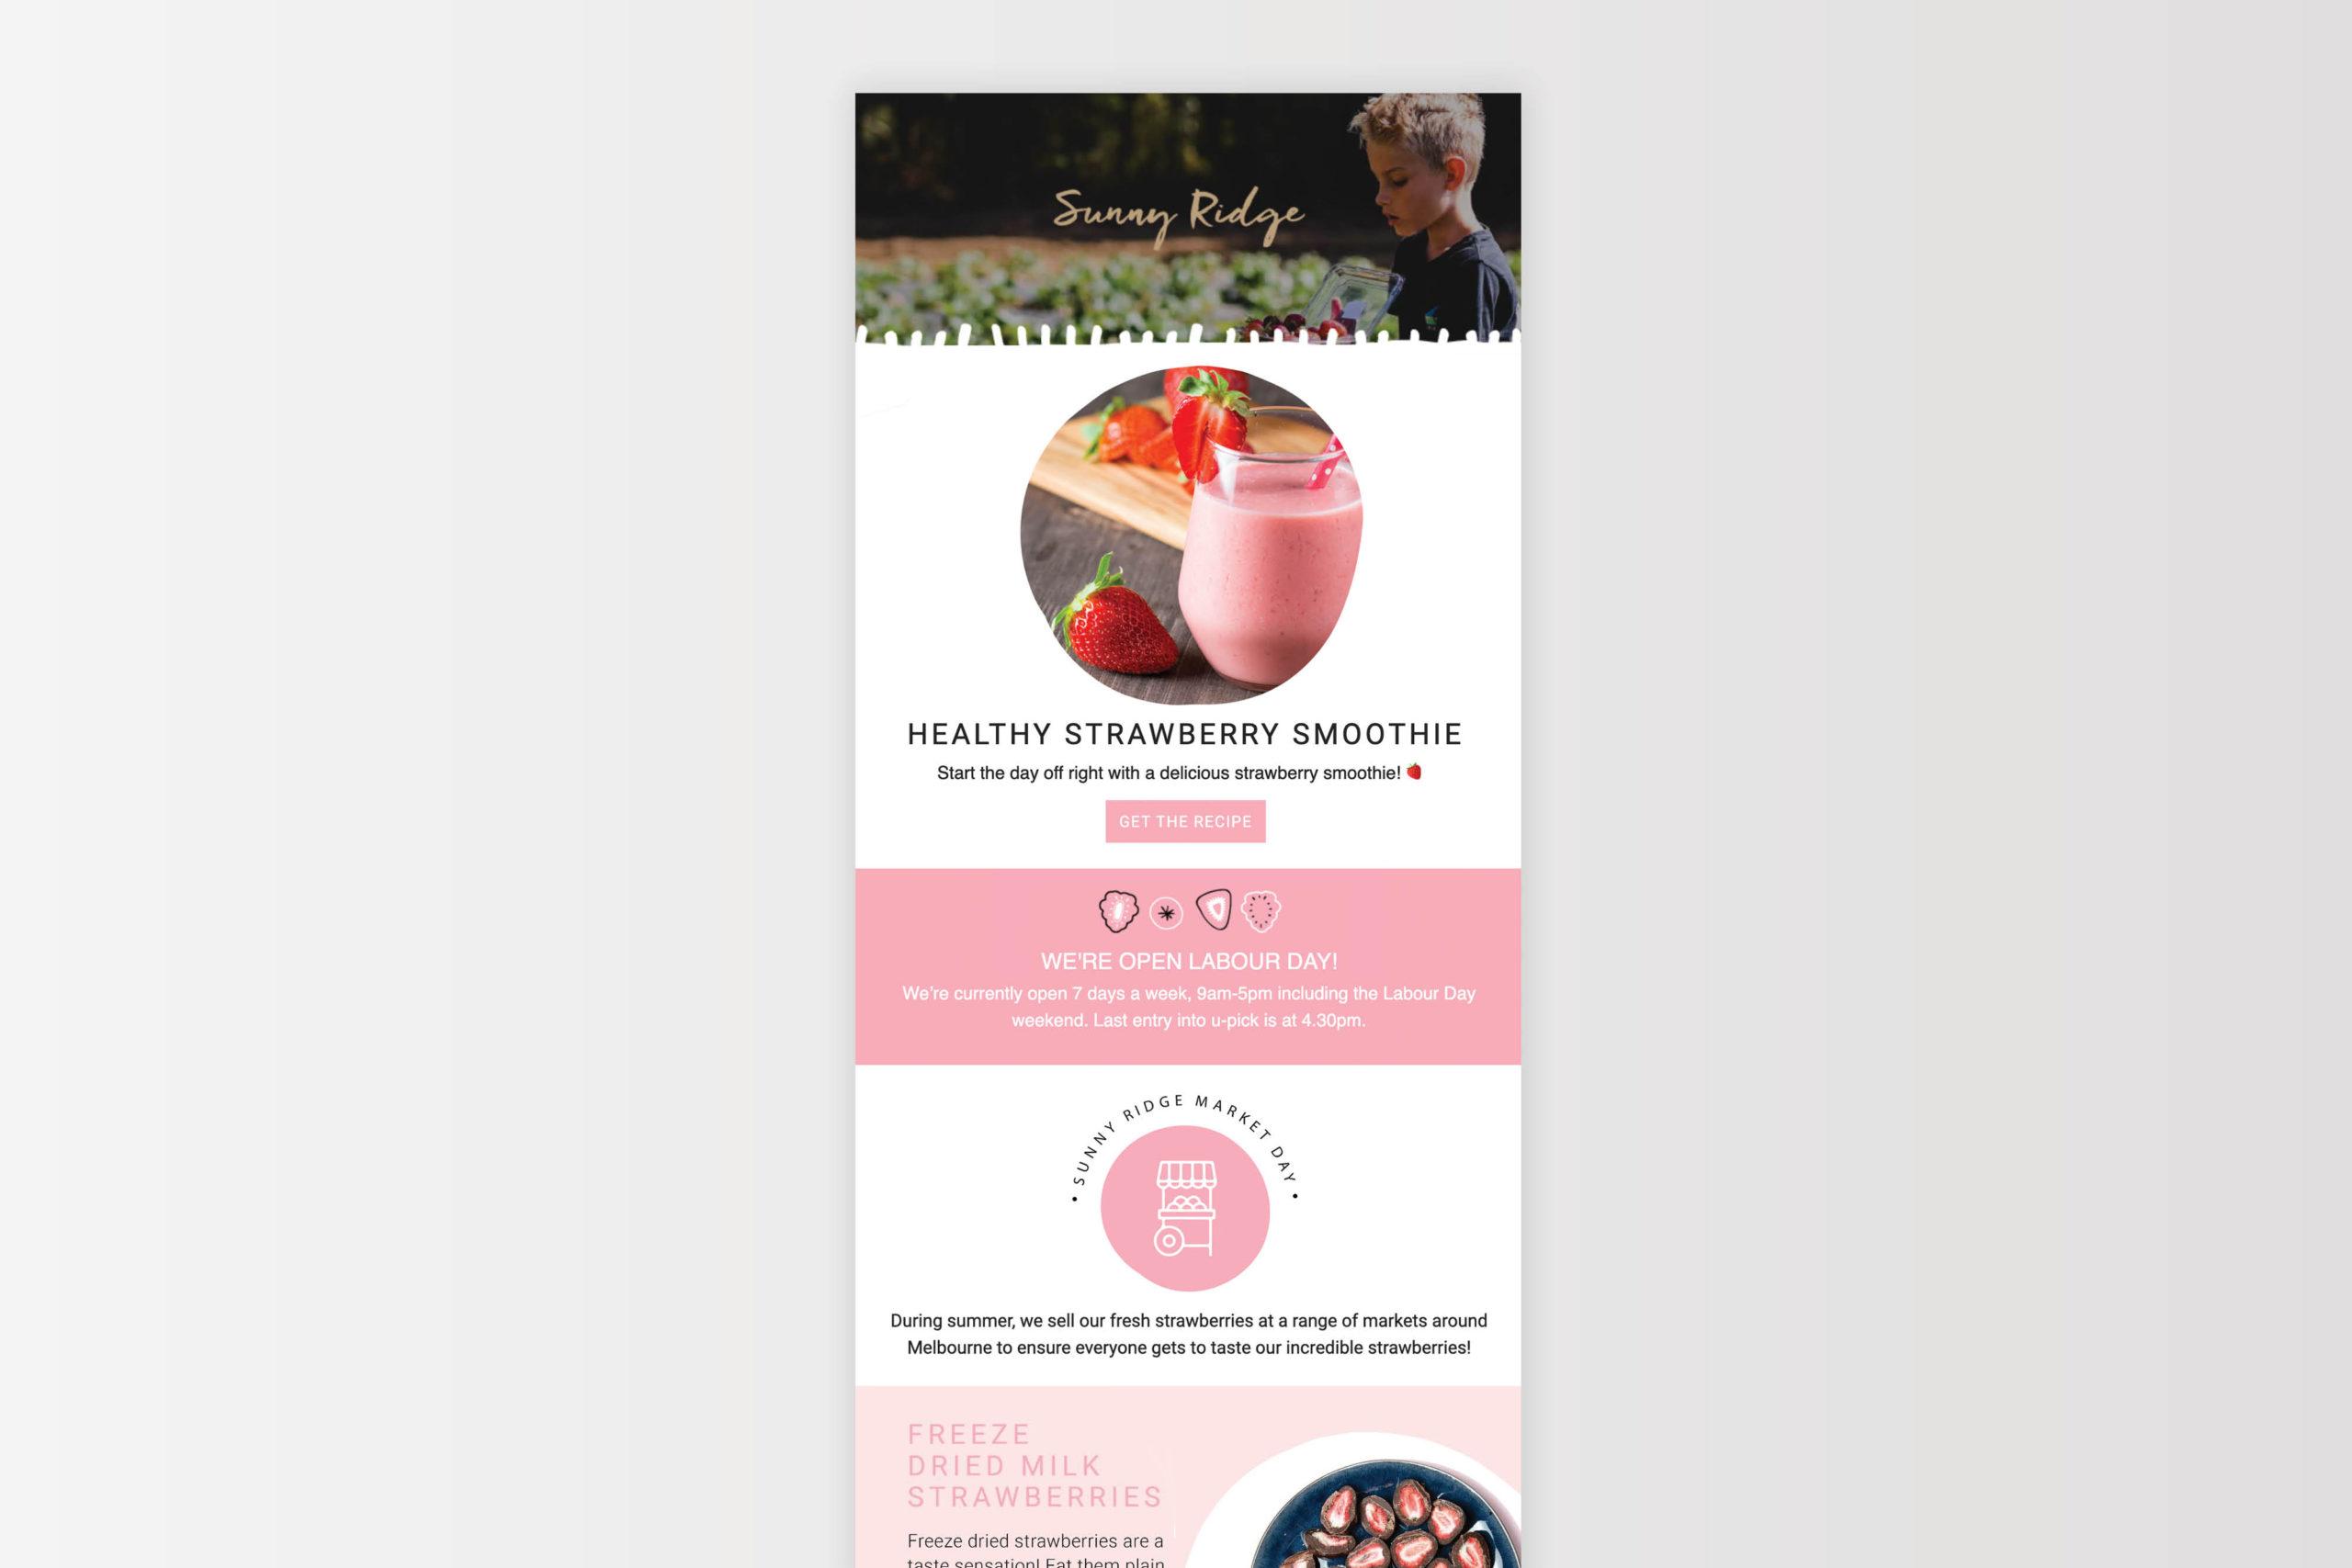 Sunny Ridge Packaging Email Marketing